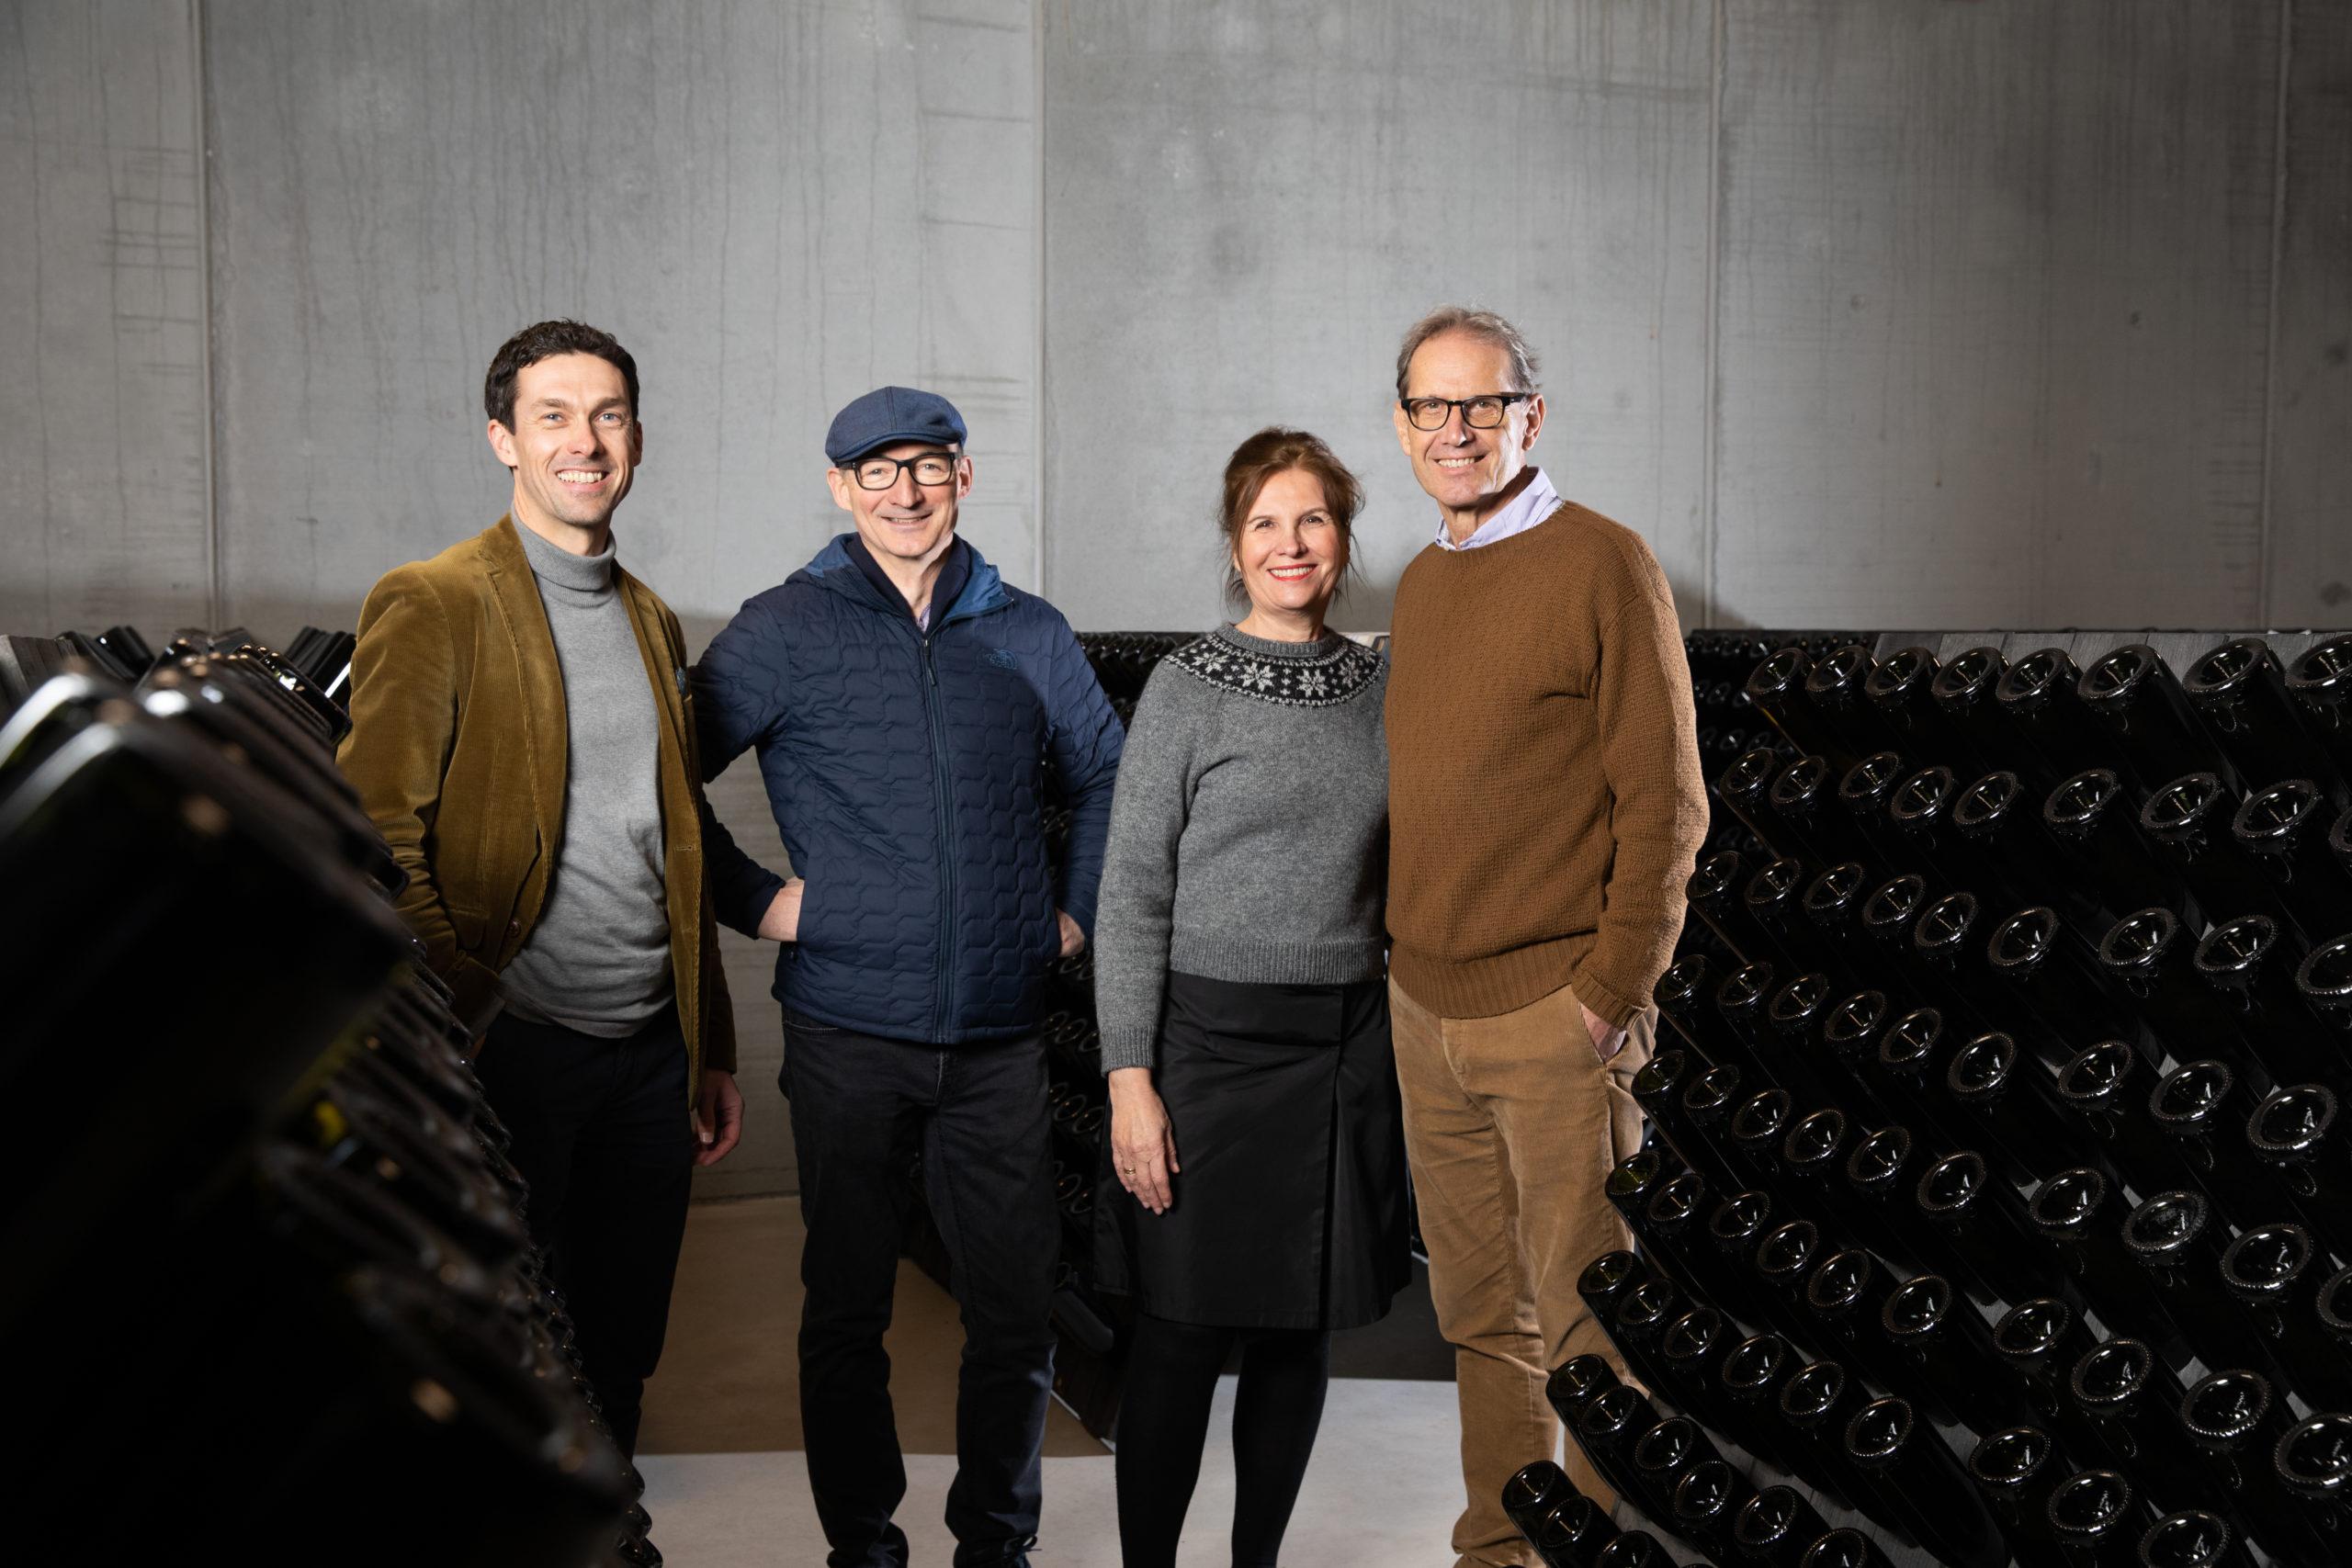 Equipe Weingut Bründlmayer